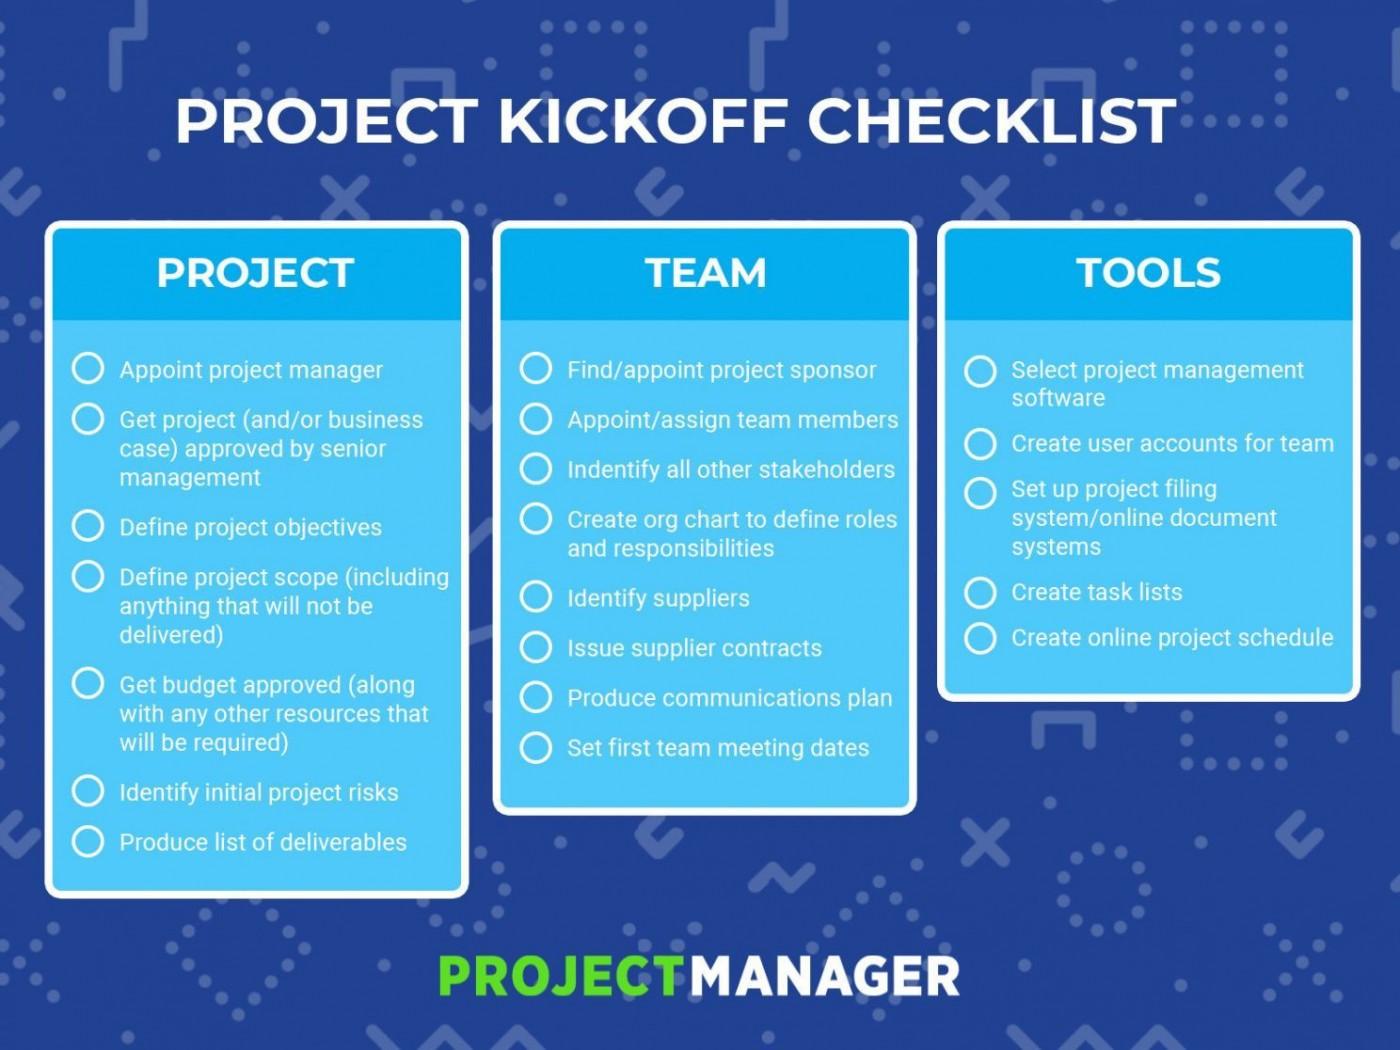 006 Sensational Project Management Kickoff Meeting Agenda Template High Resolution 1400